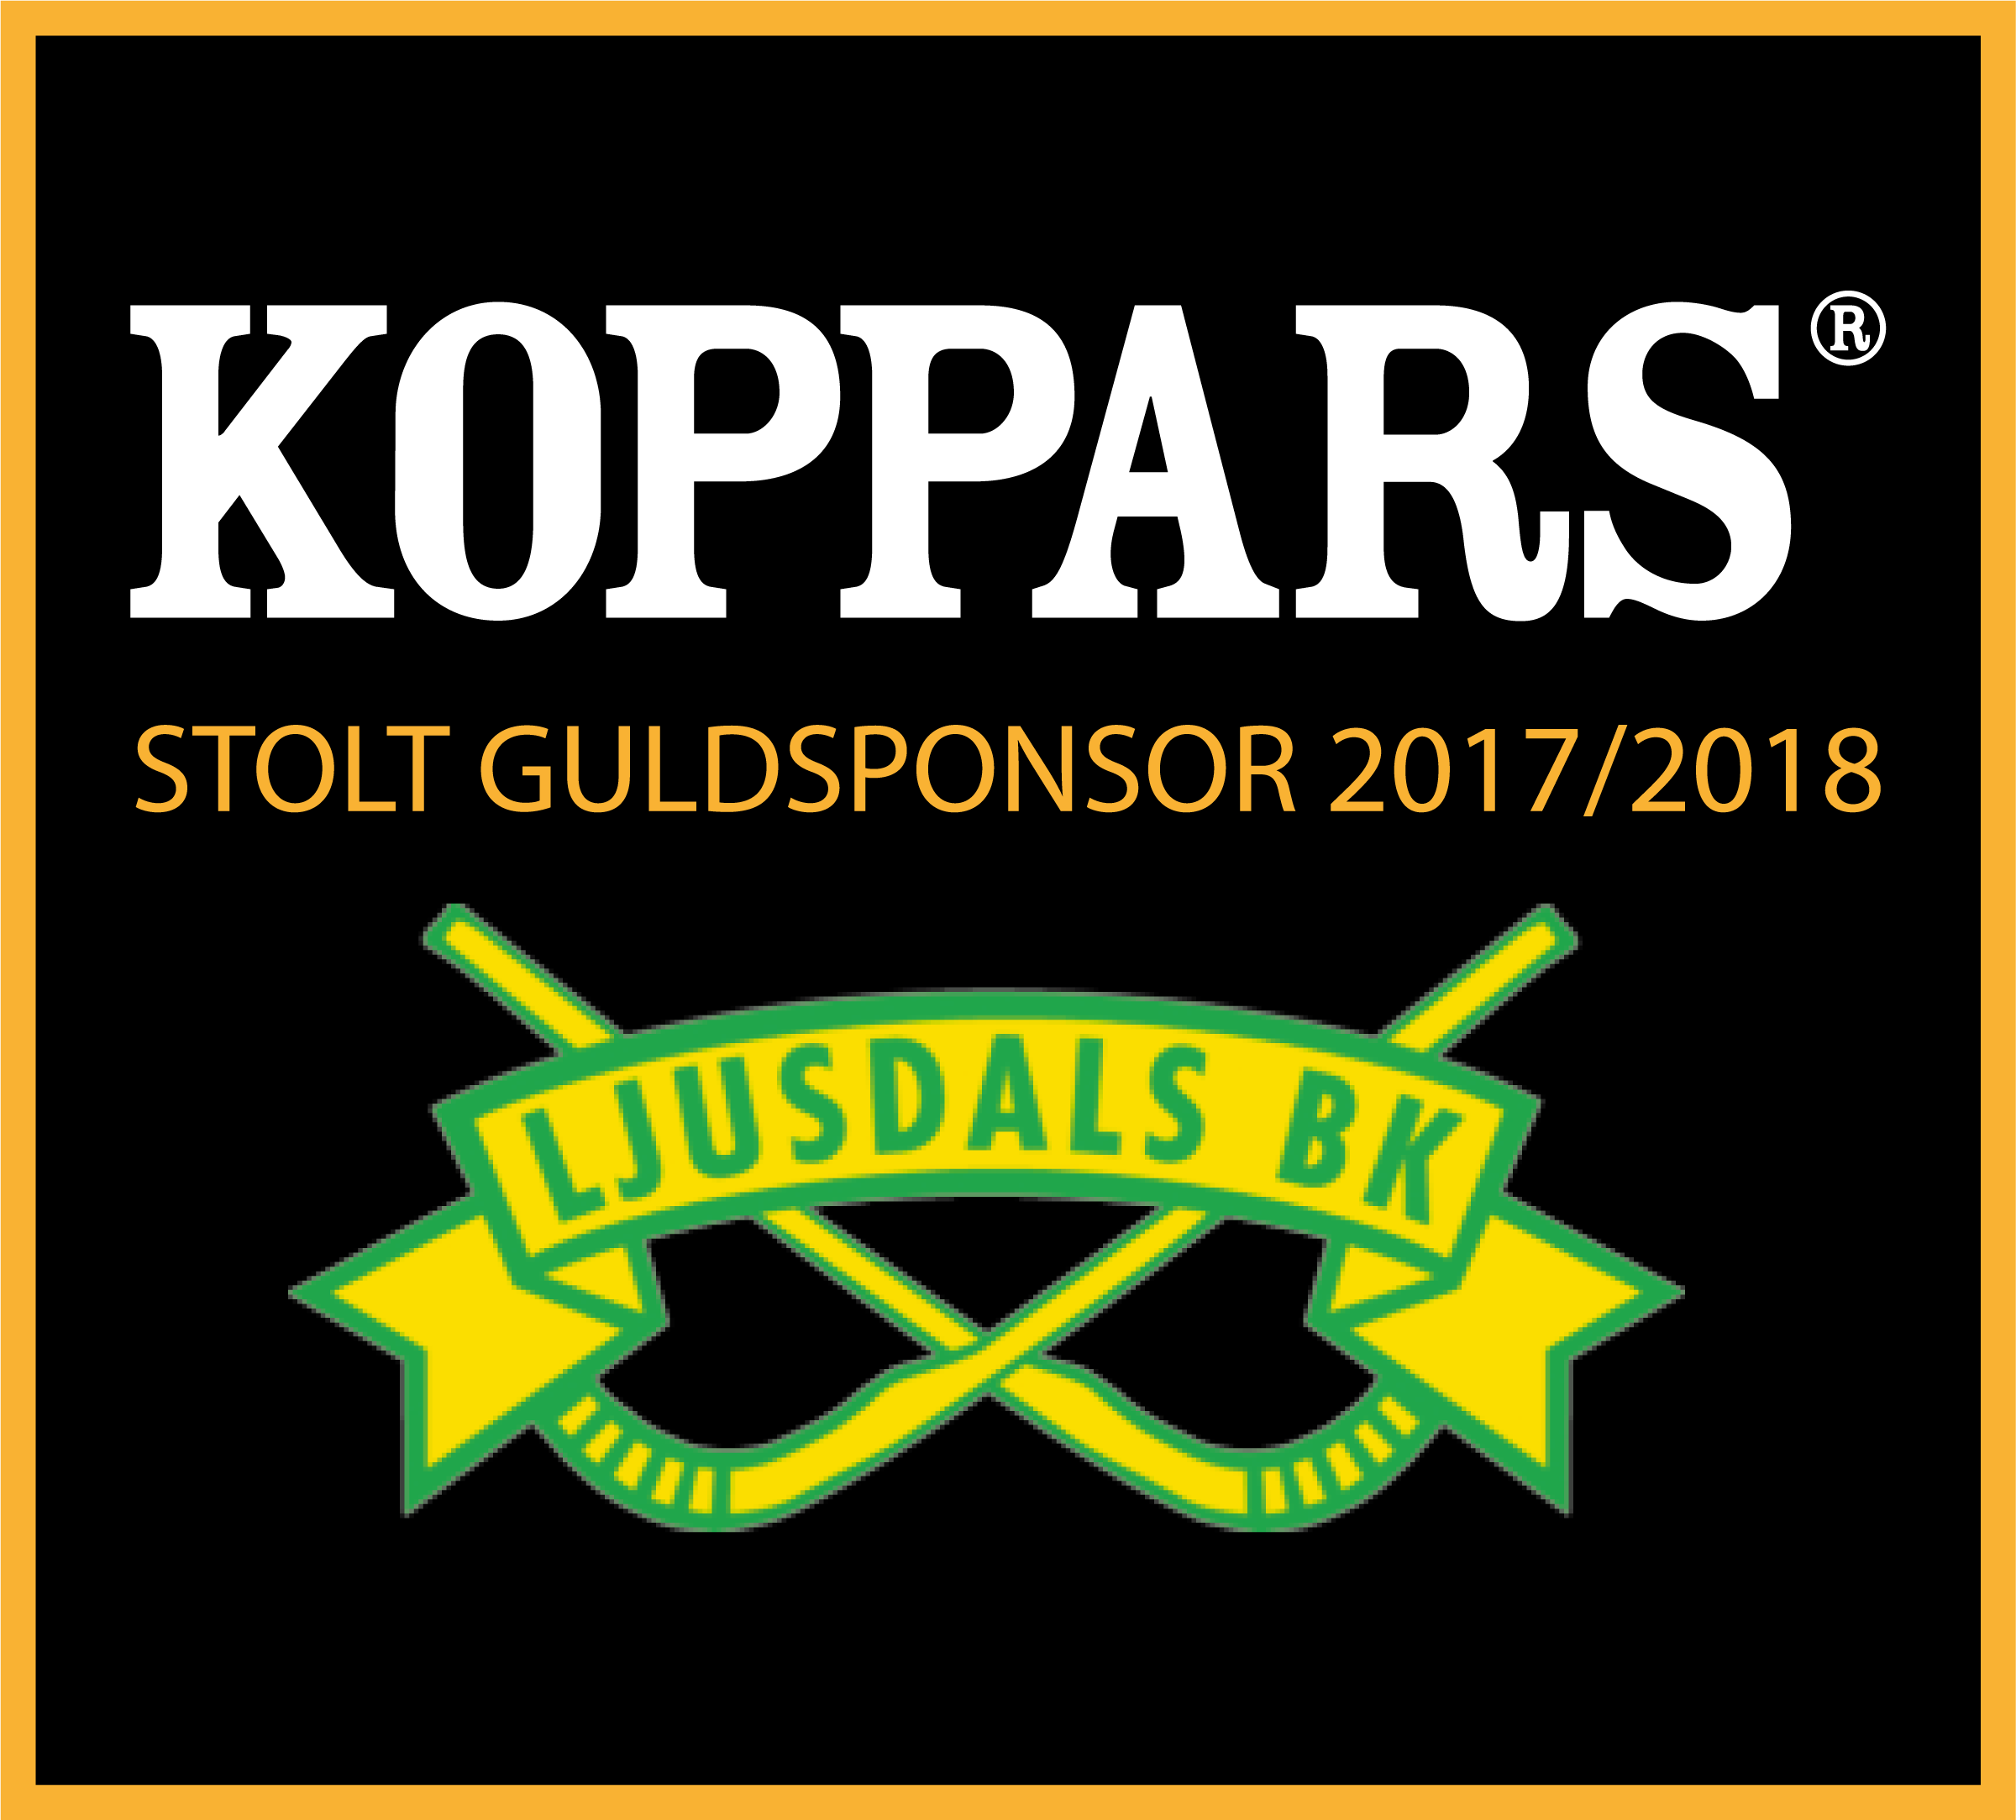 Guldsponsor till Ljusdals Bandy